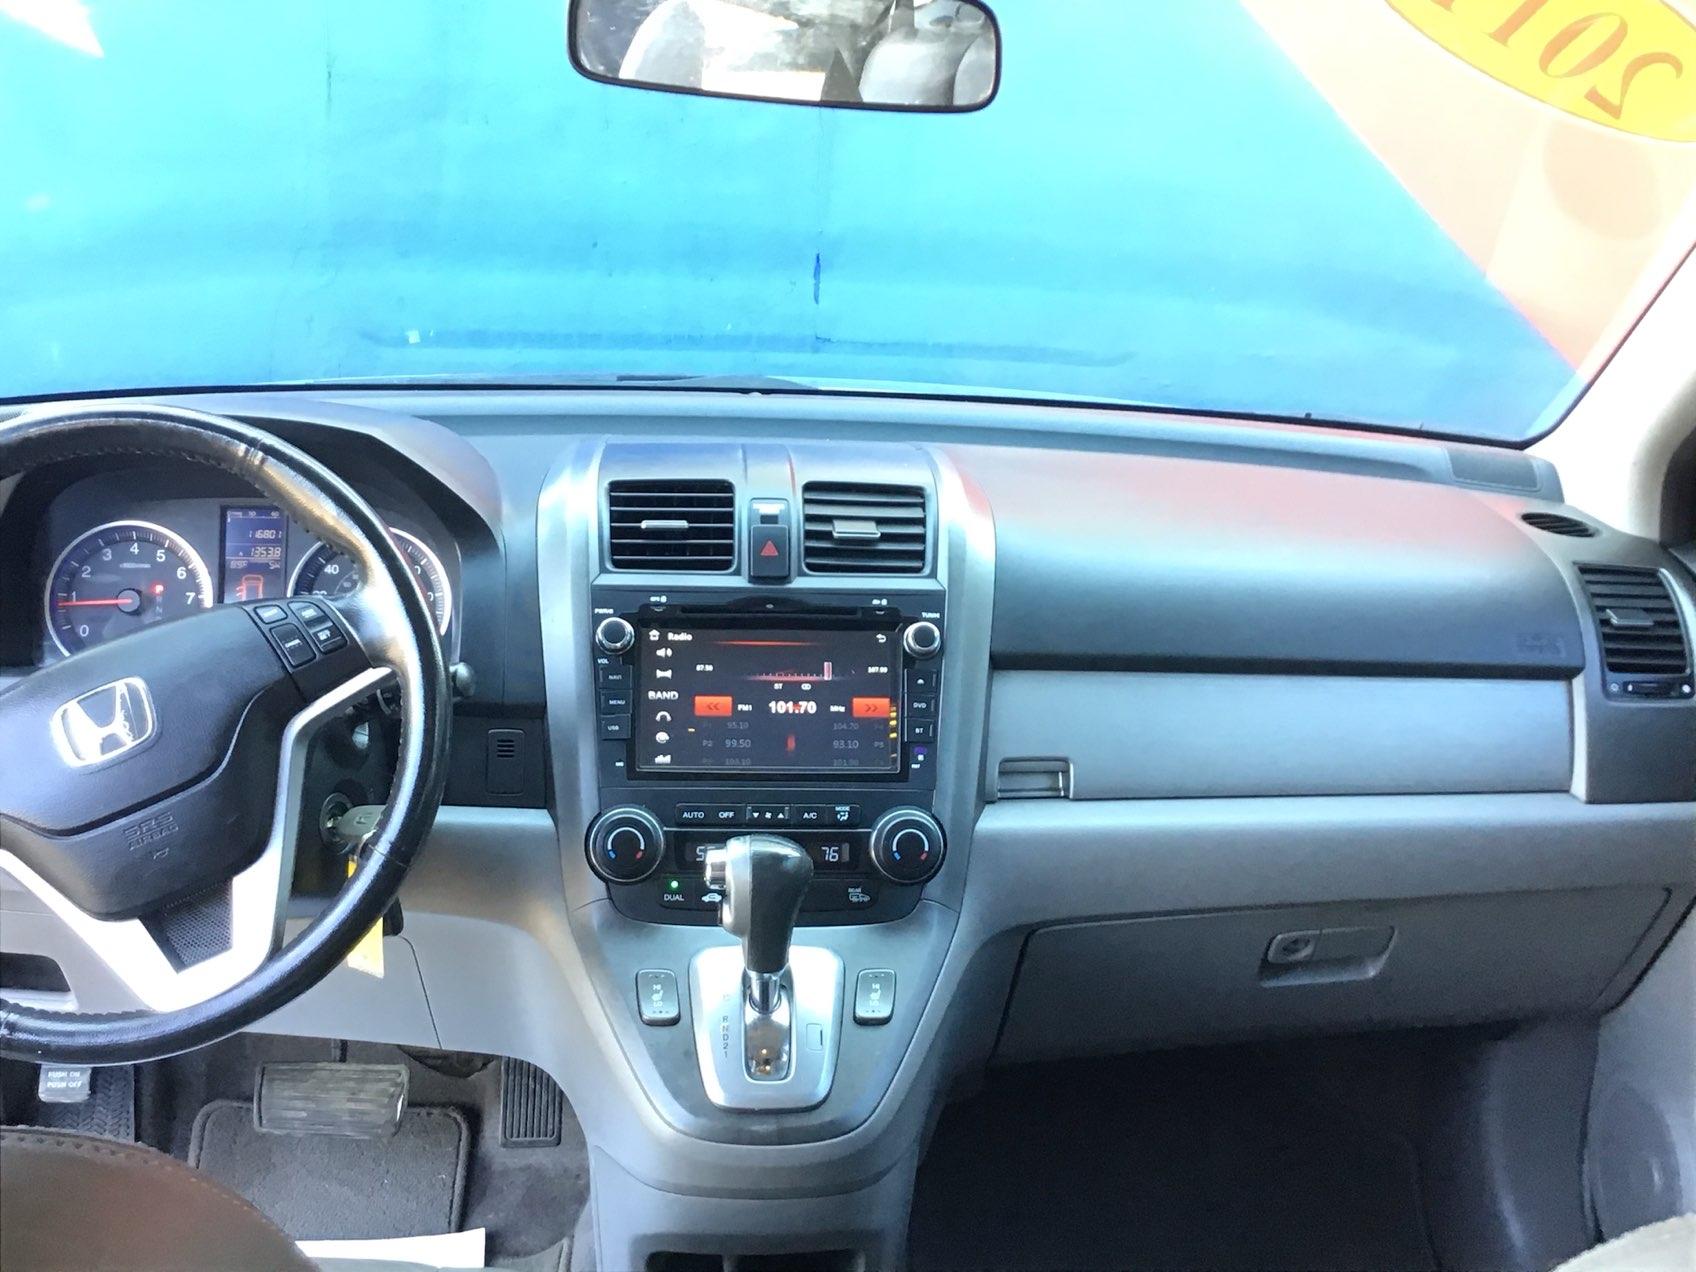 used vehicle - SUV HONDA CR-V 2011